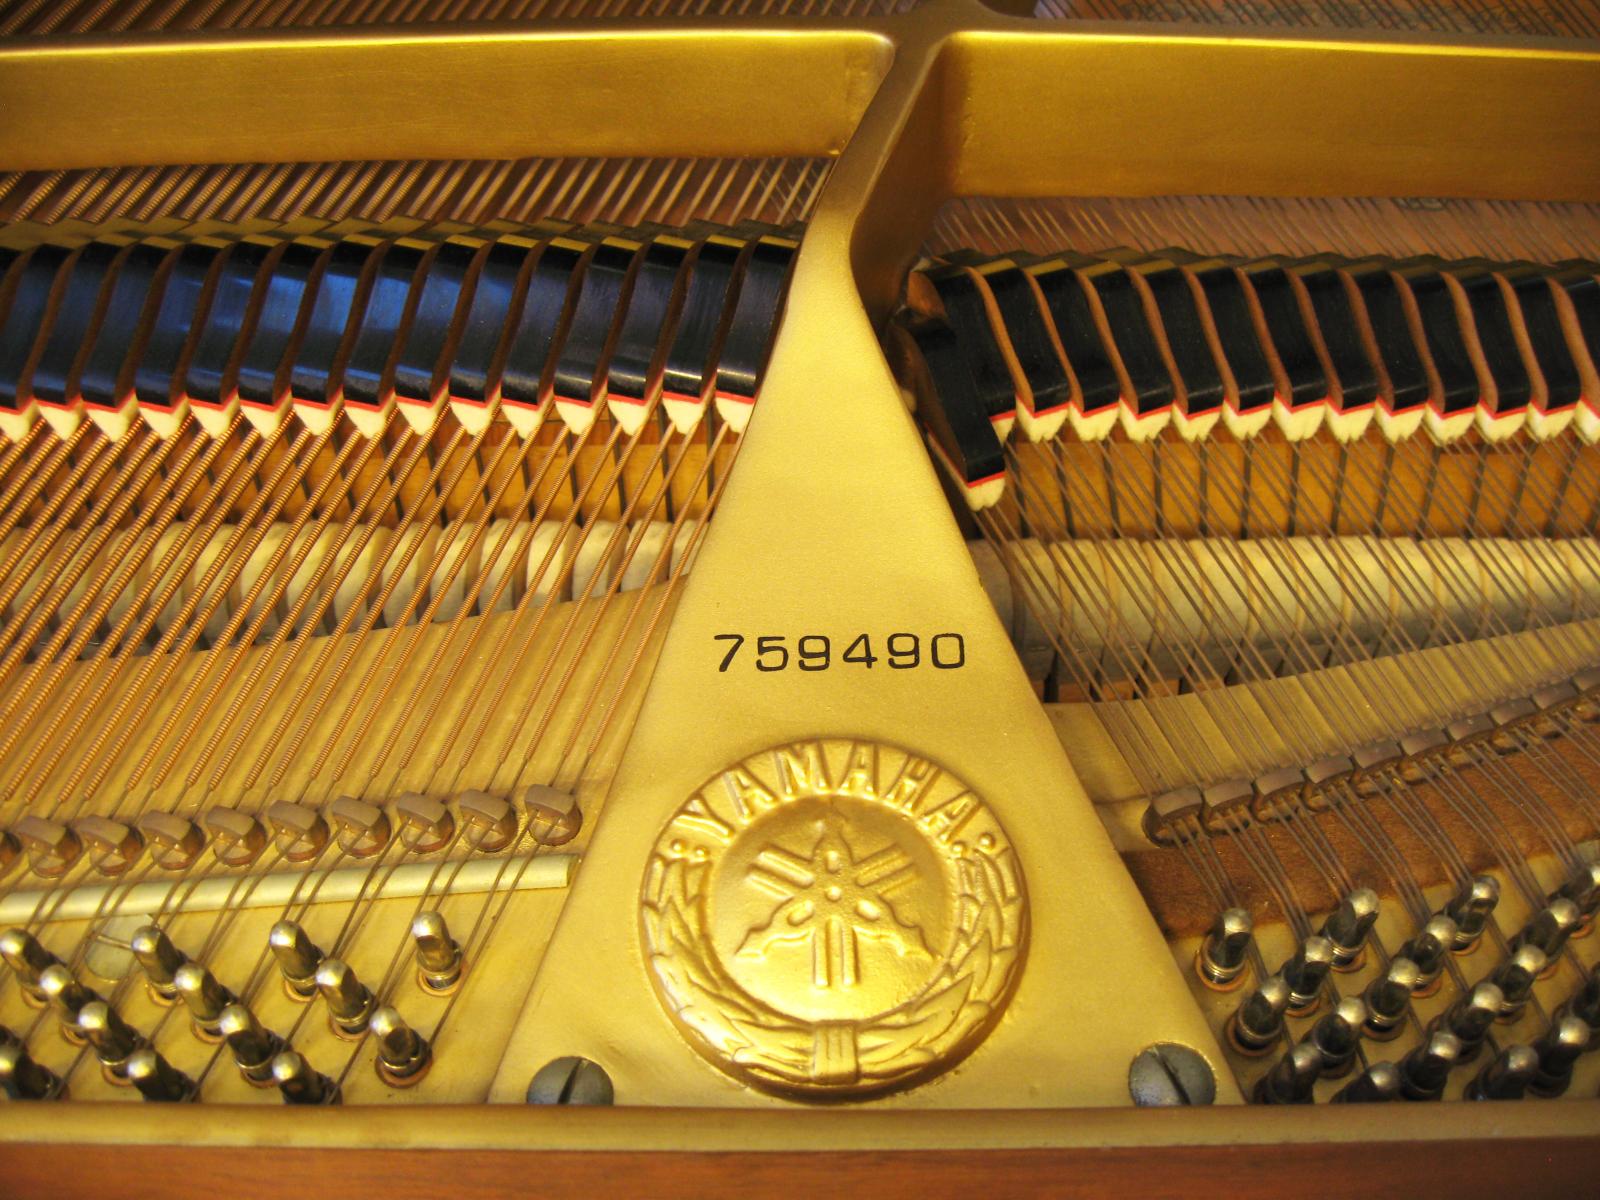 TK's Piano Warehouse image